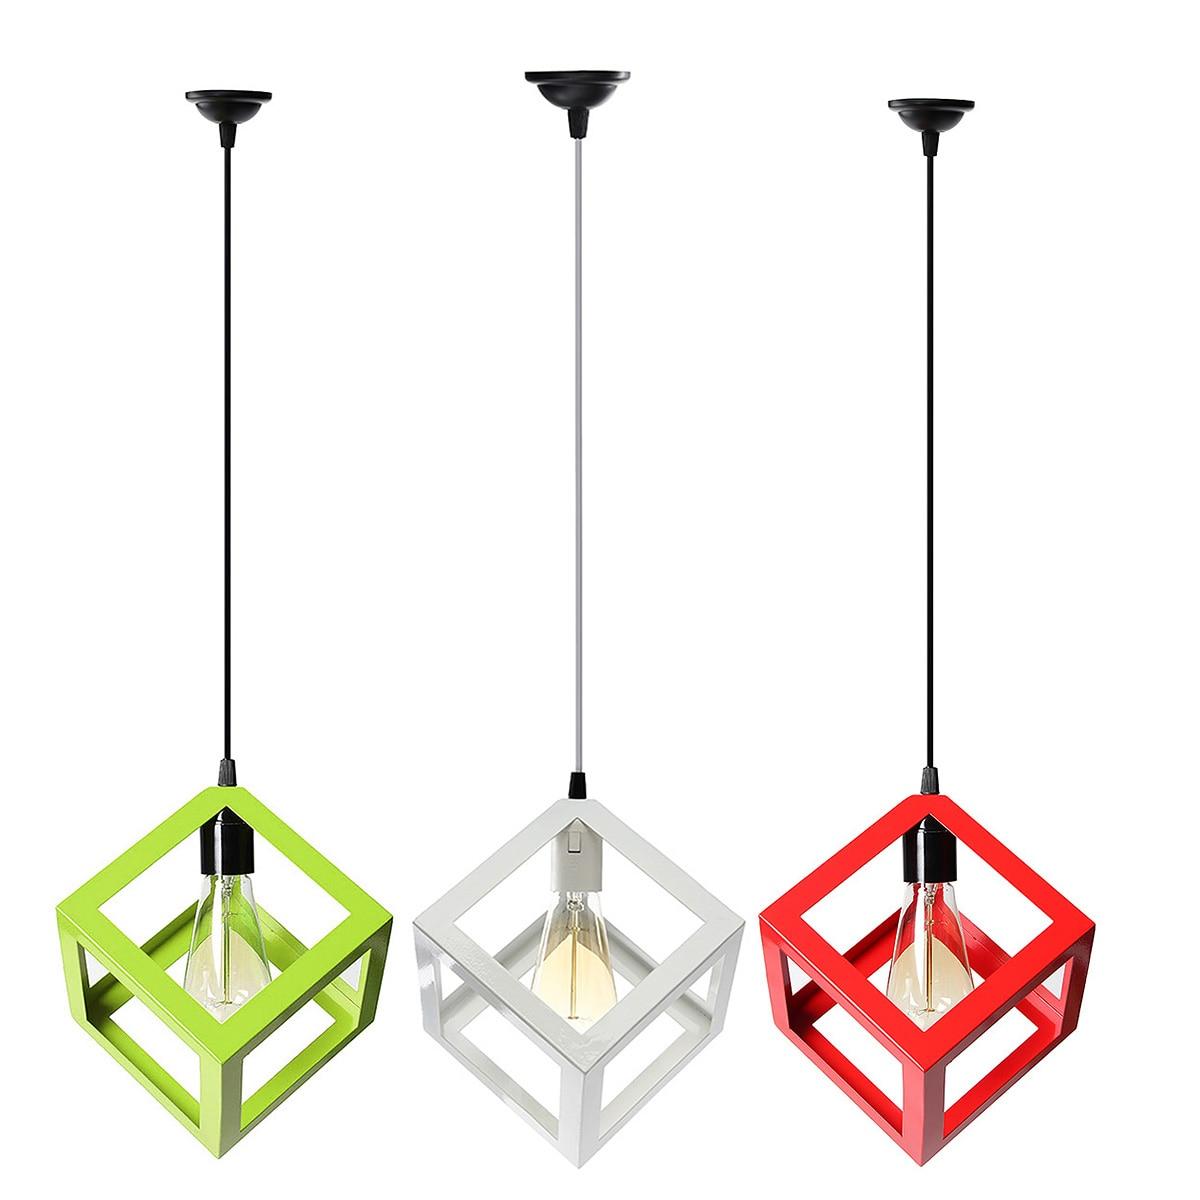 E27 Modern Cast Iron Cube DIY Pendant Light Shape Northern Euro Hanging Light Lamp Base Home Office Bar Restaurant Decor 1M Wire нивелир ada cube 2 360 home edition a00448